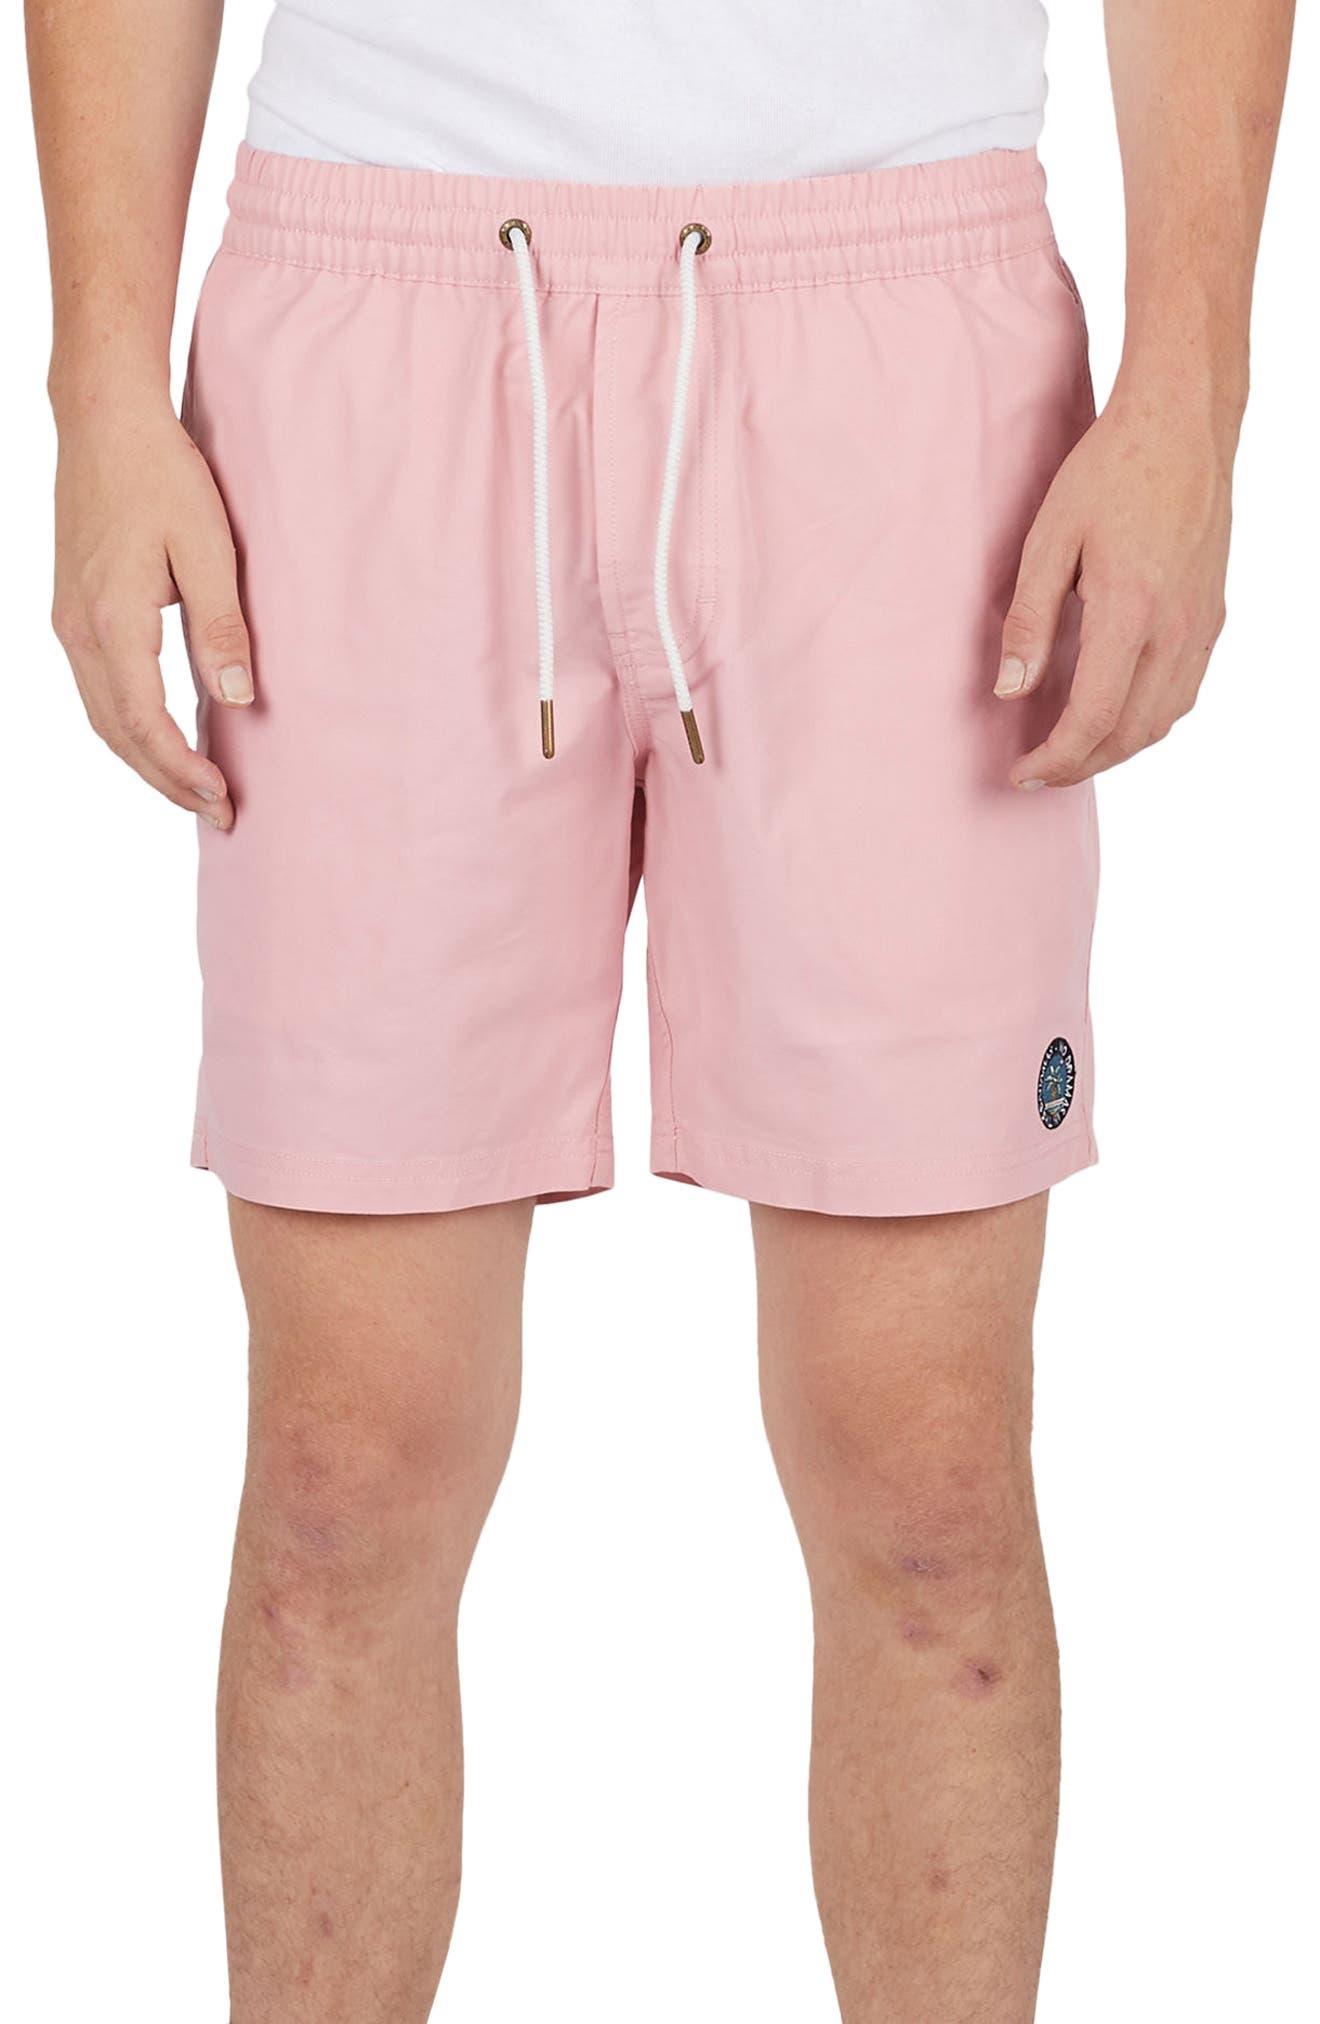 Amphibious Shorts,                         Main,                         color, Pink